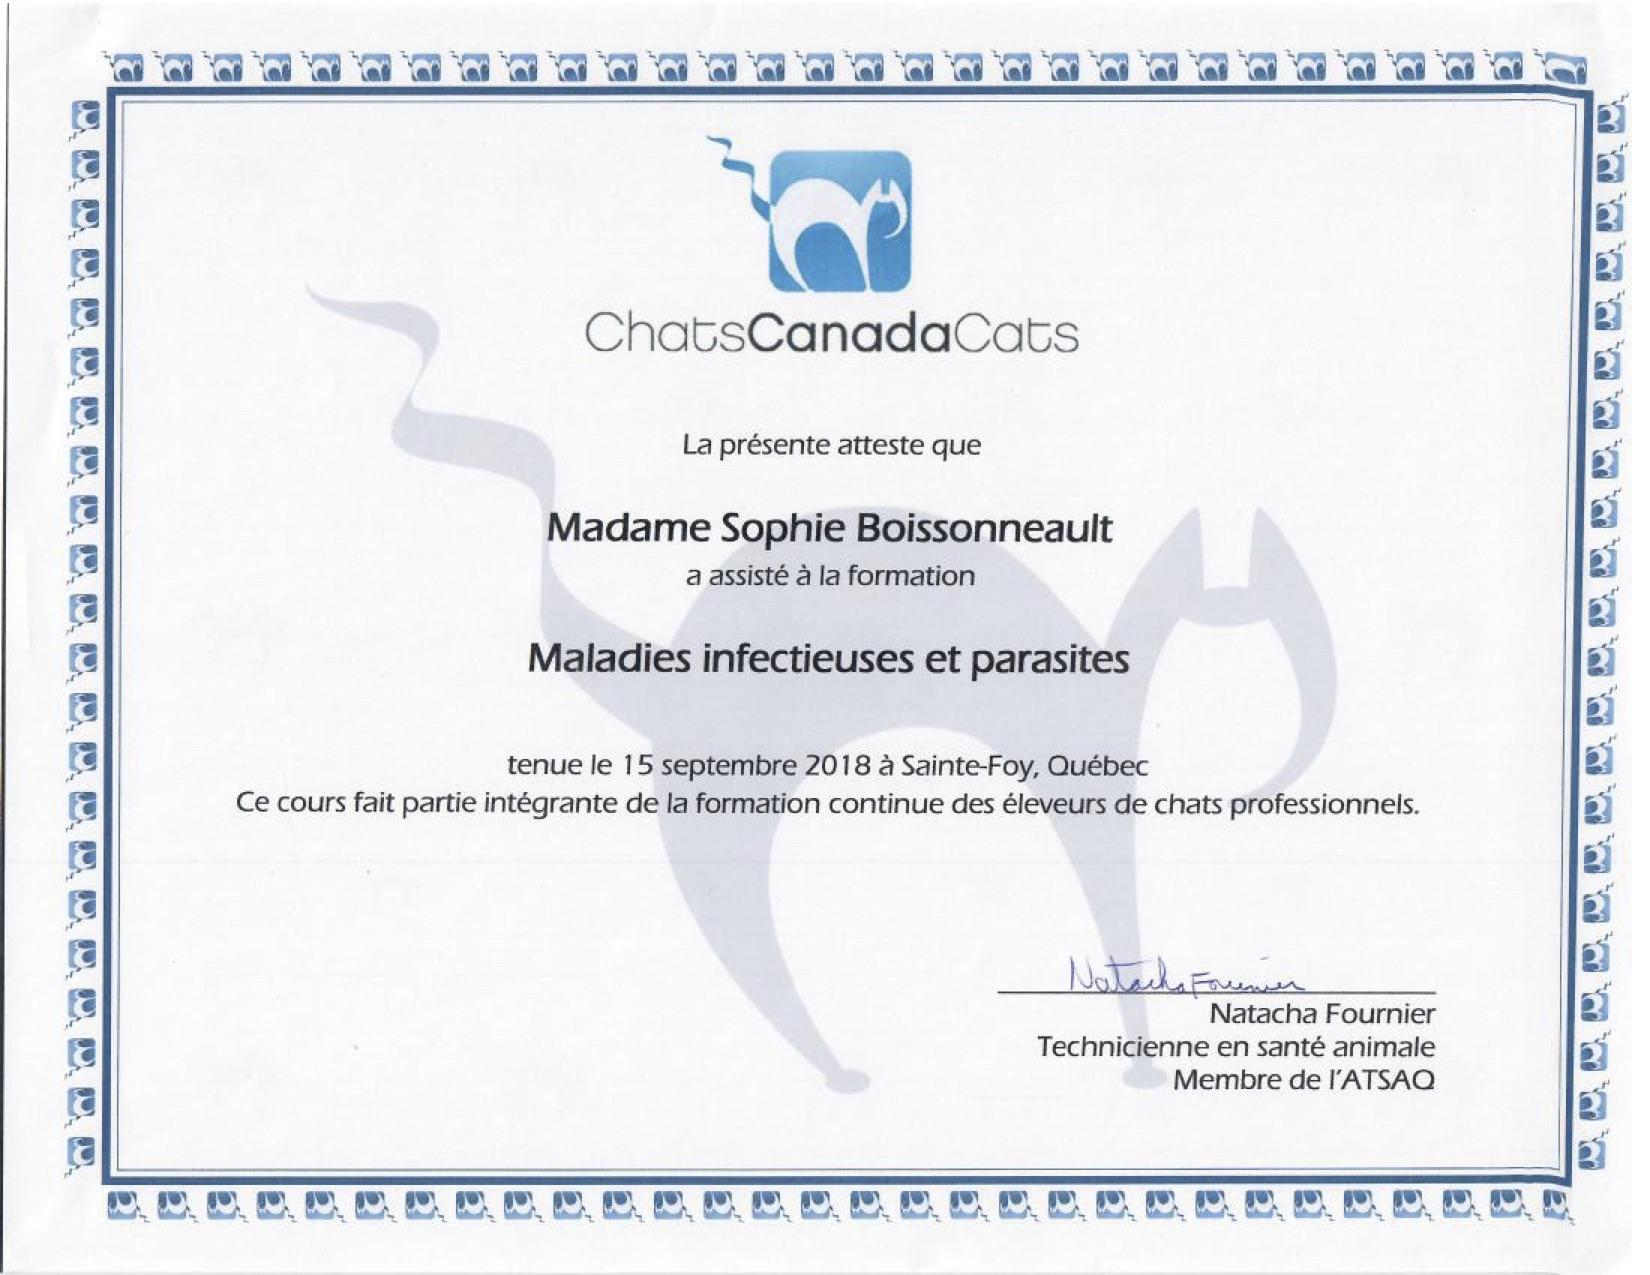 Certificats CCC - Maladies Infectieuses et parasites